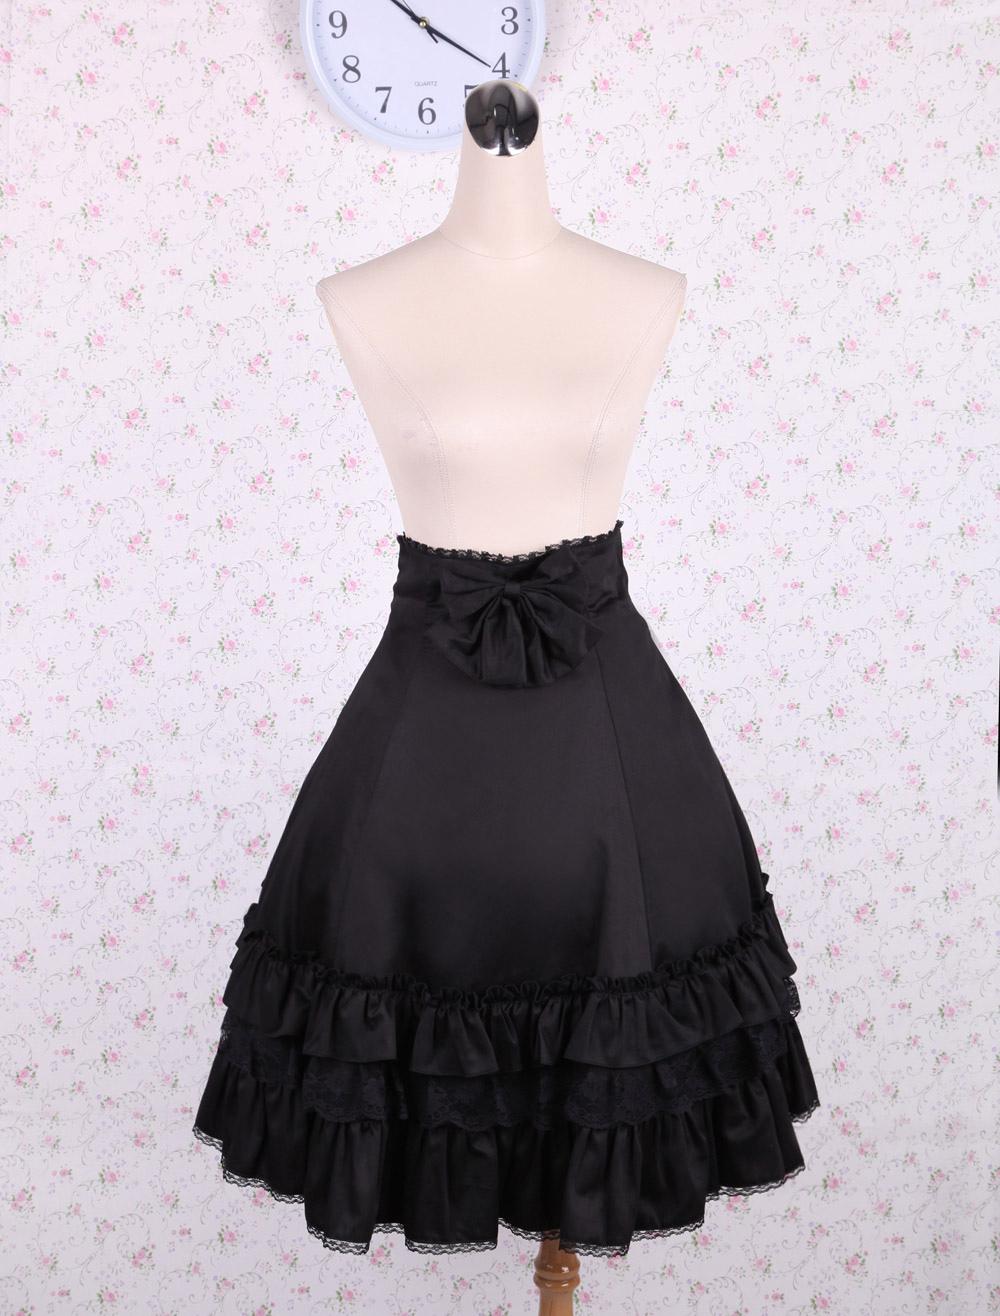 Elegant Black High Waist Lolita Skirt Ruffles Bow and Lace Trim